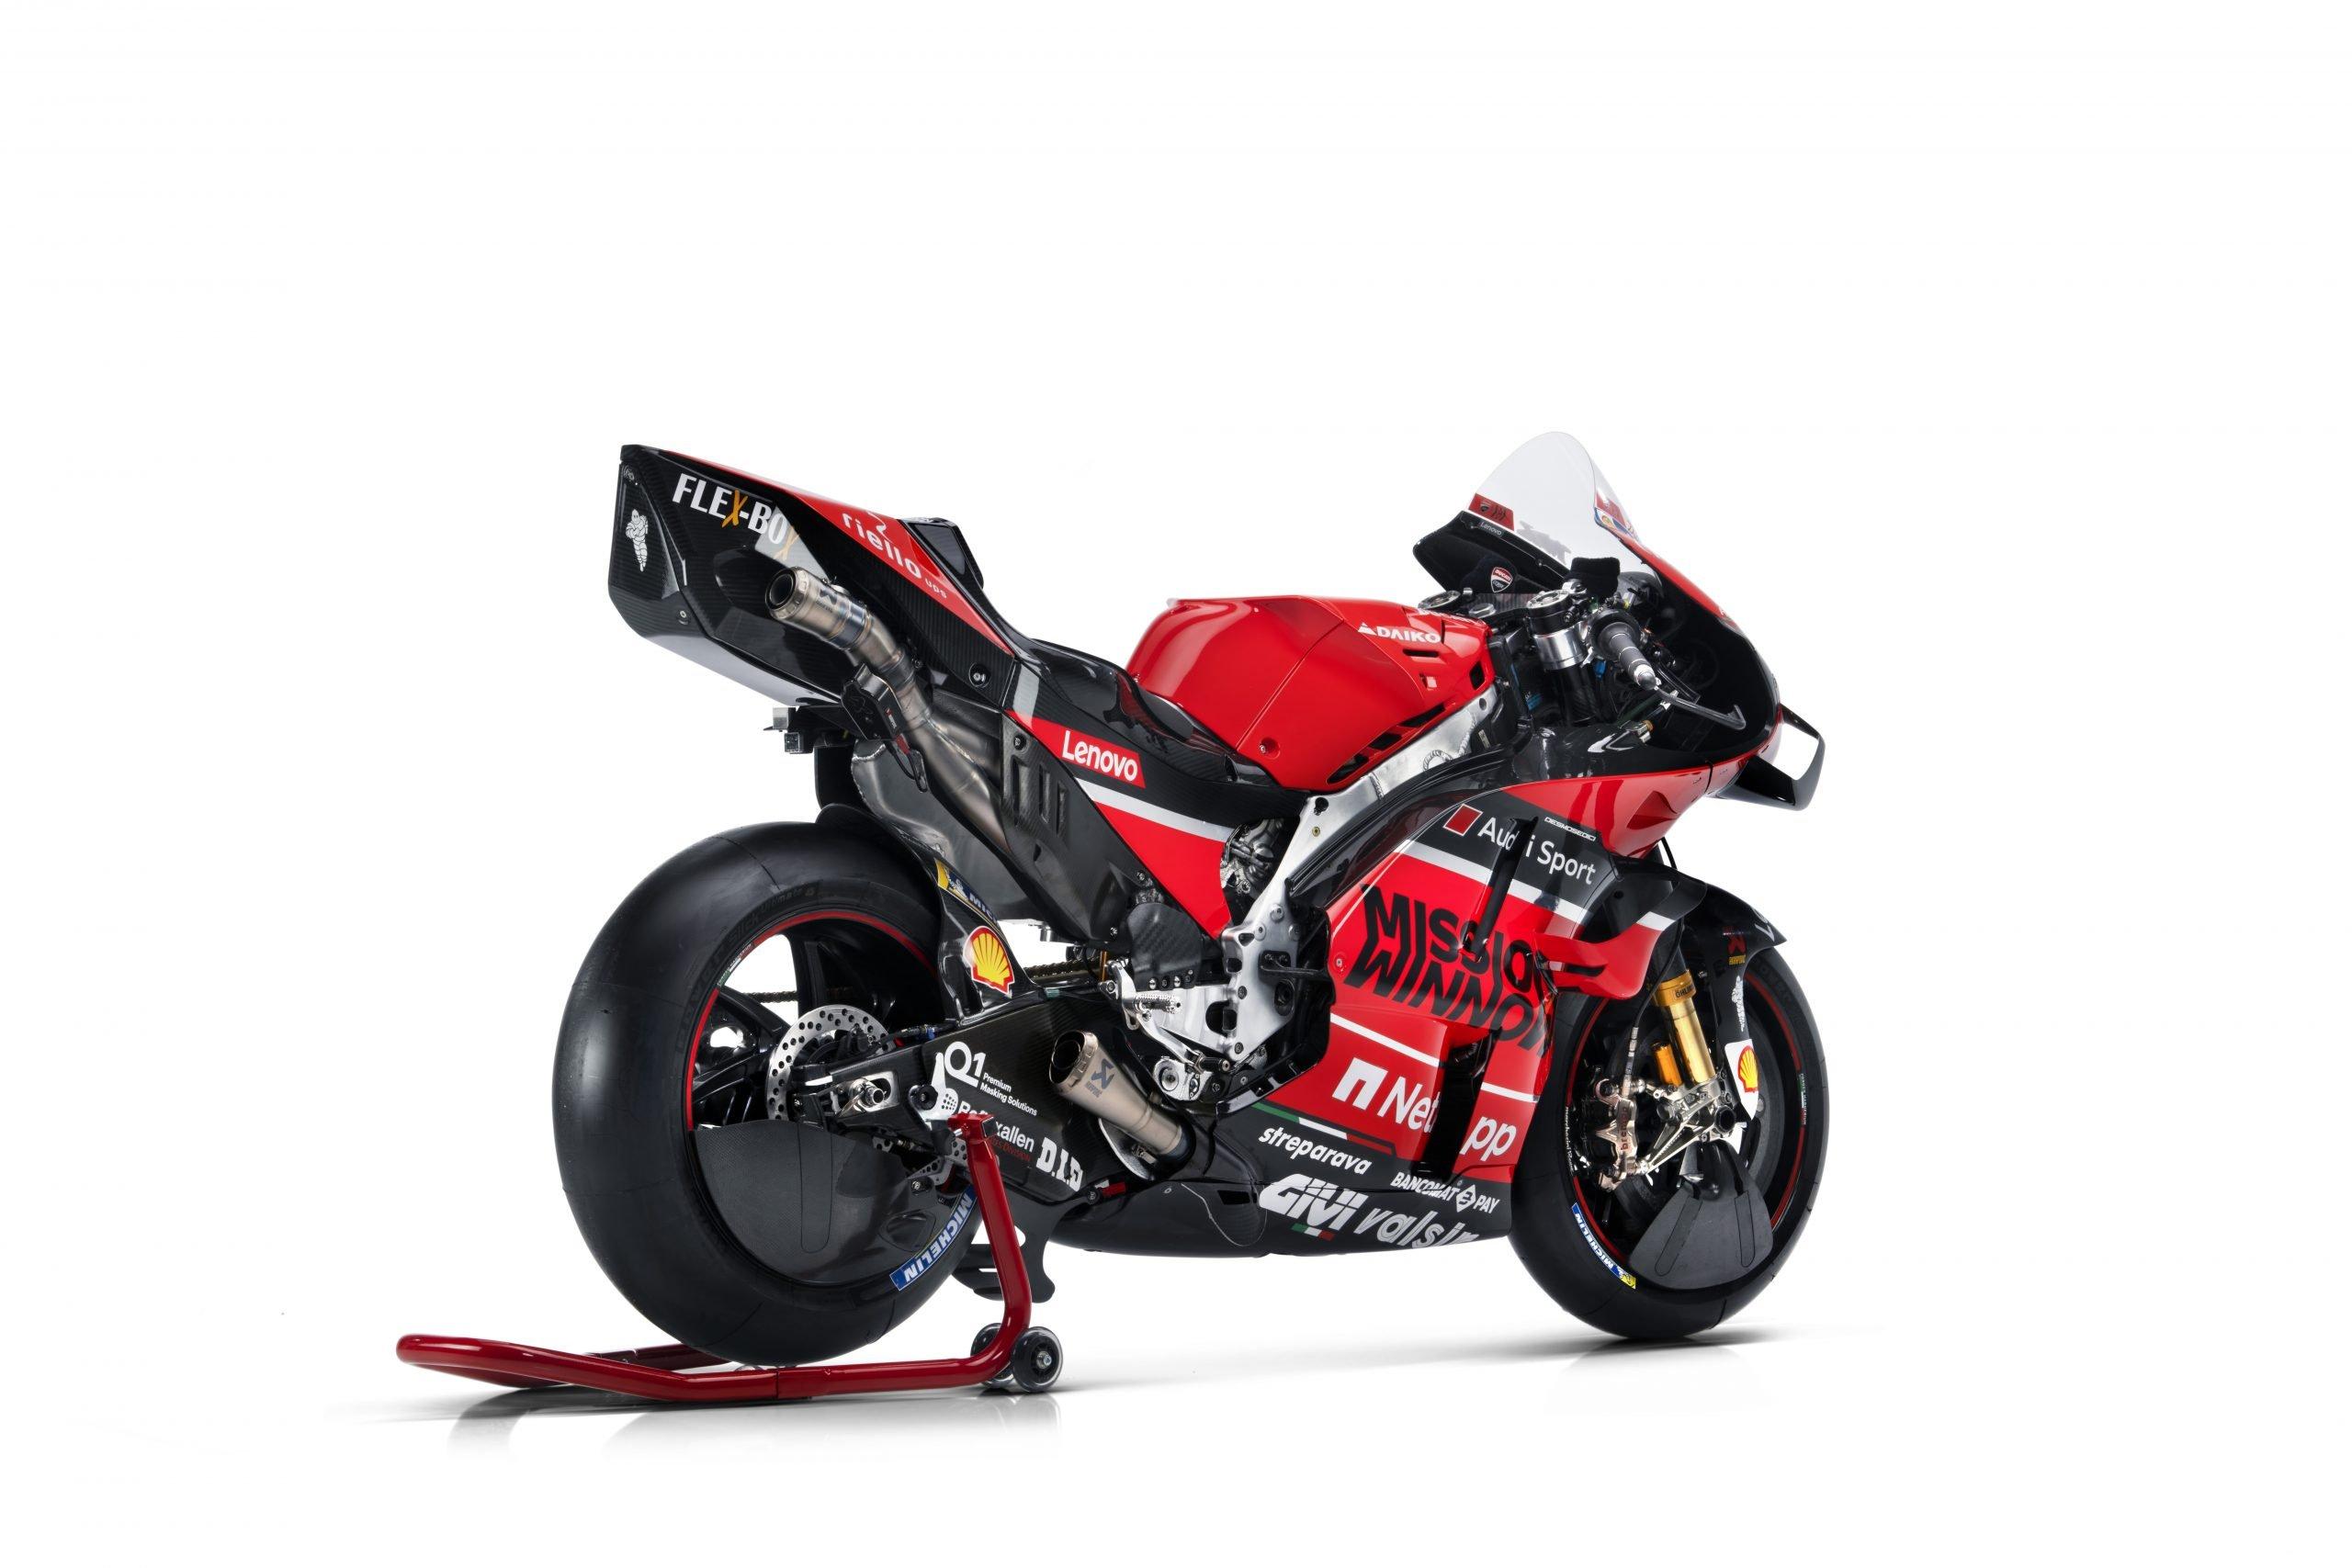 2020 – Ducati: Viejenial